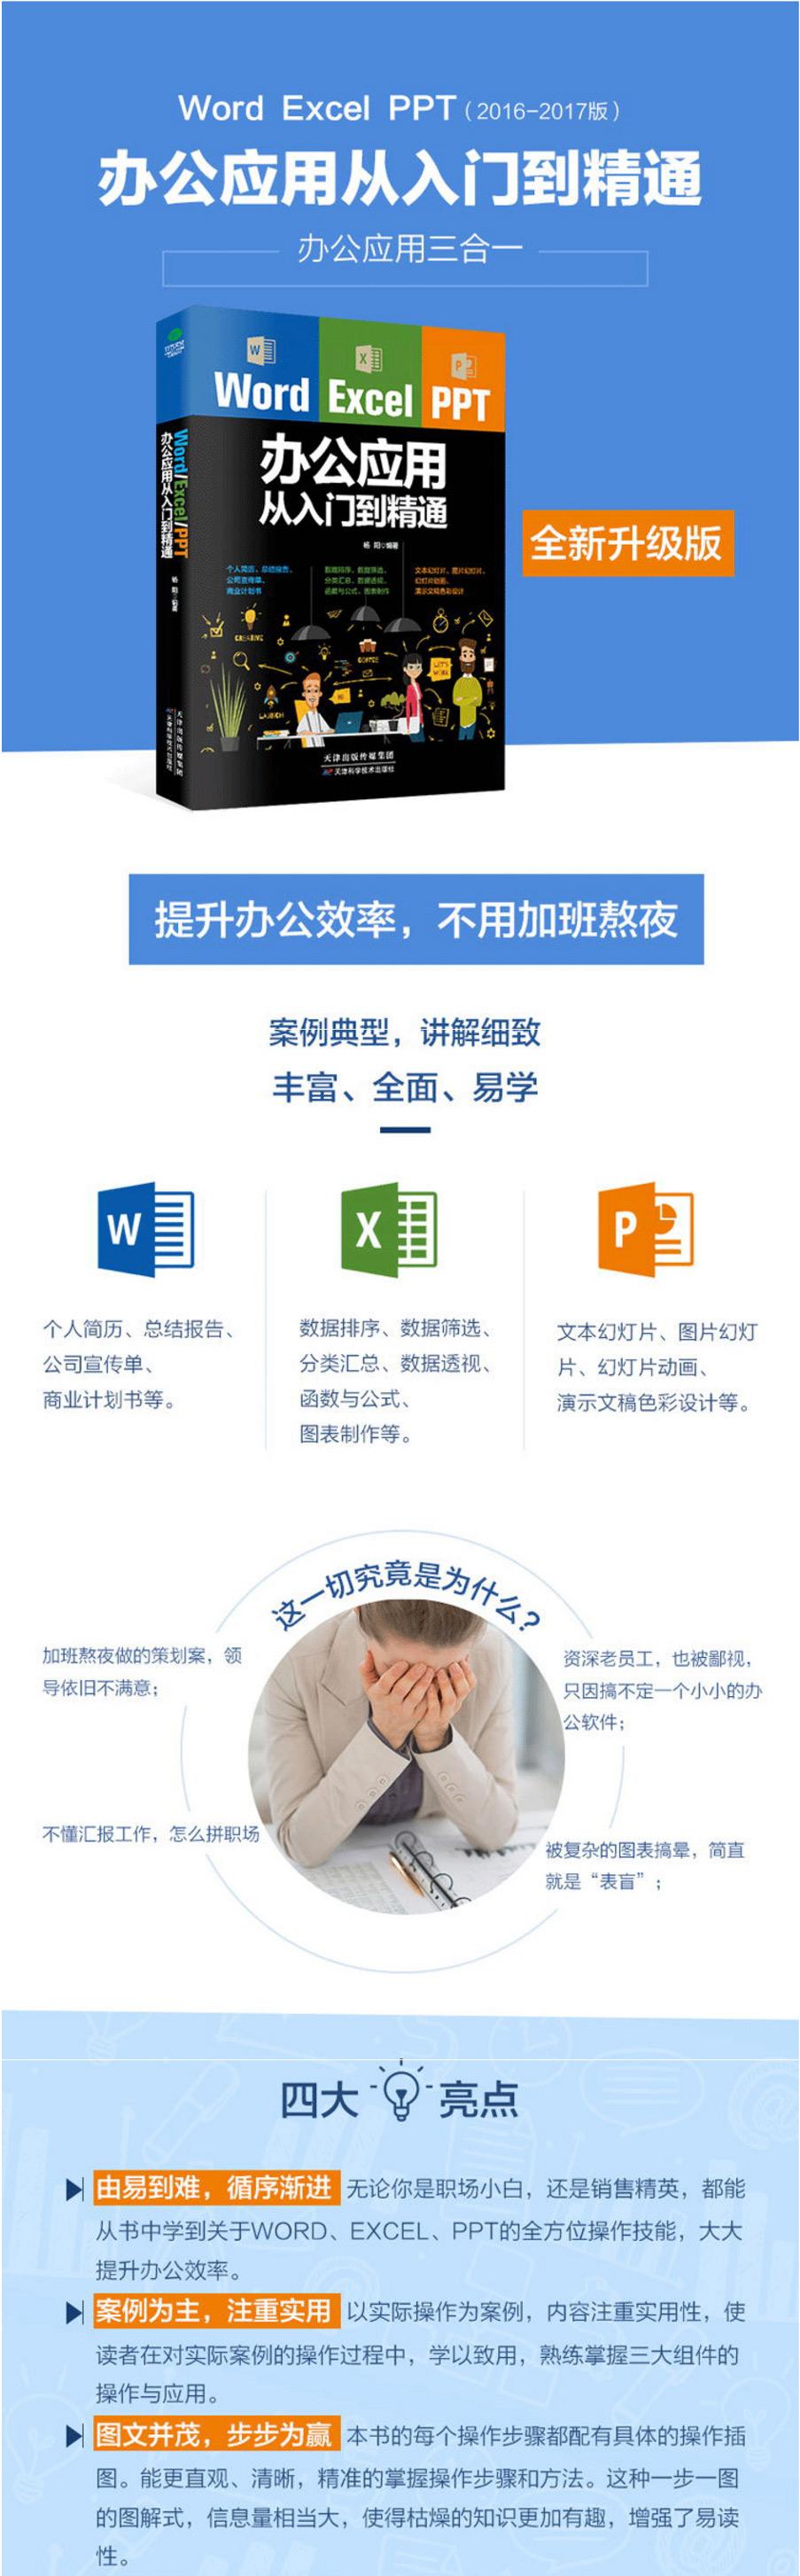 Word Excel PPT办公应用从入门到精通office文档编辑计算机办公软件三合一 办公书籍